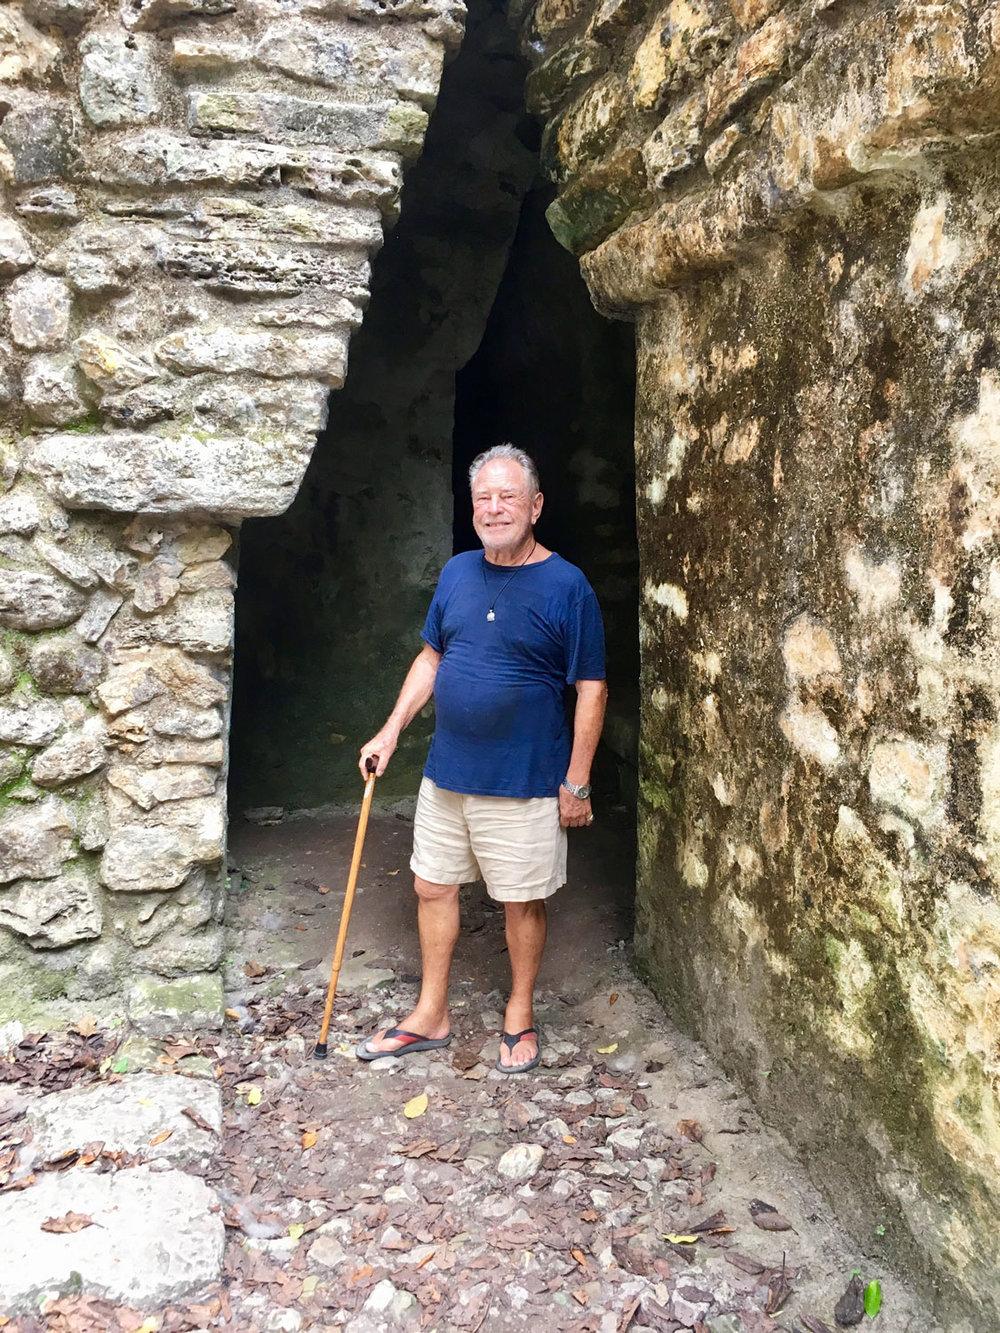 Hammocks_and_Ruins_Blog_Riviera_Maya_Mexico_Travel_Discover_Chiapas_What_to_do_Ruins_Yaxchilan_9.jpg